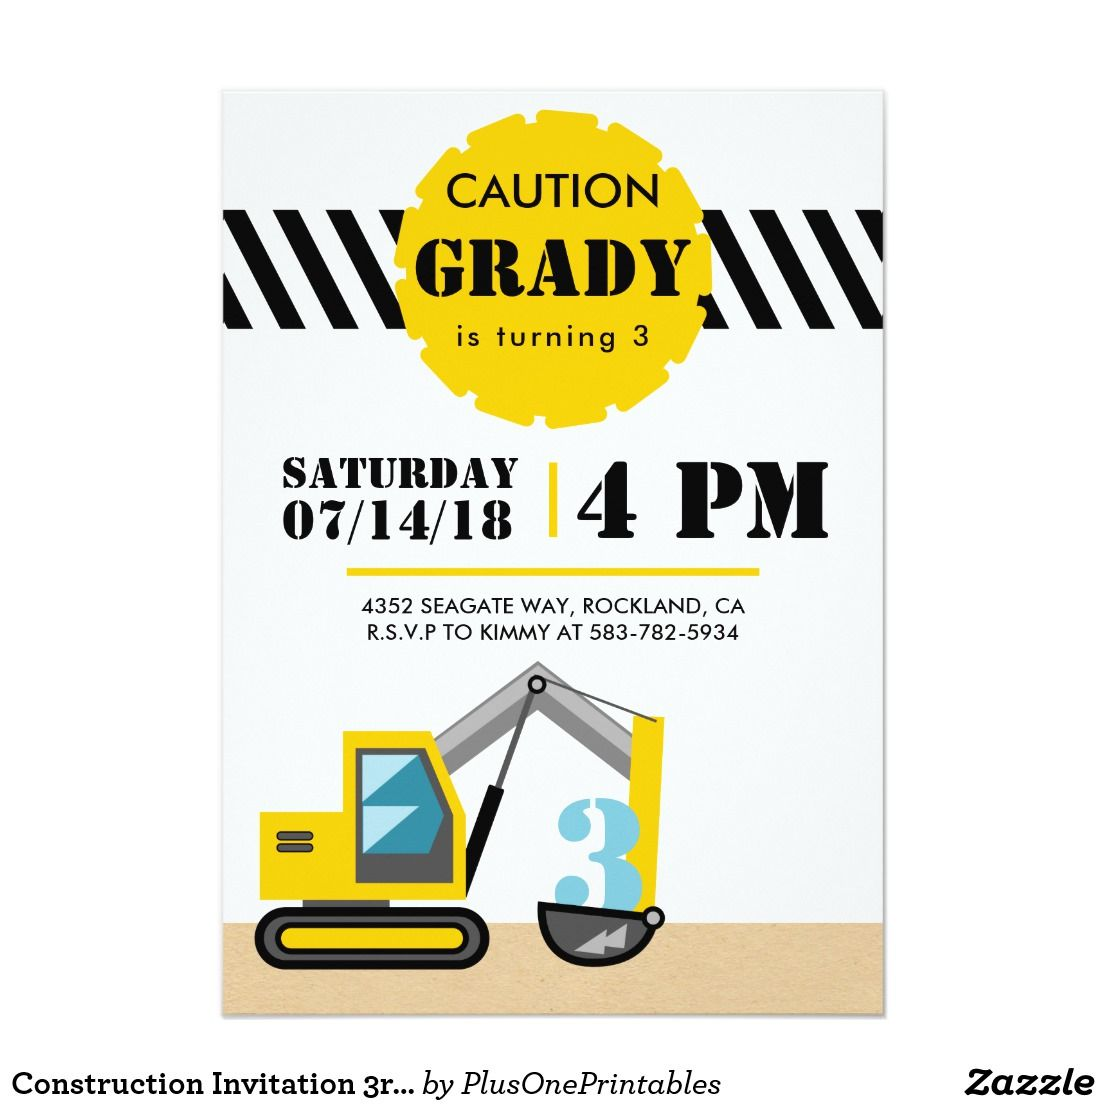 Construction Invitation 3rd Birthday Third Invite | Construction ...